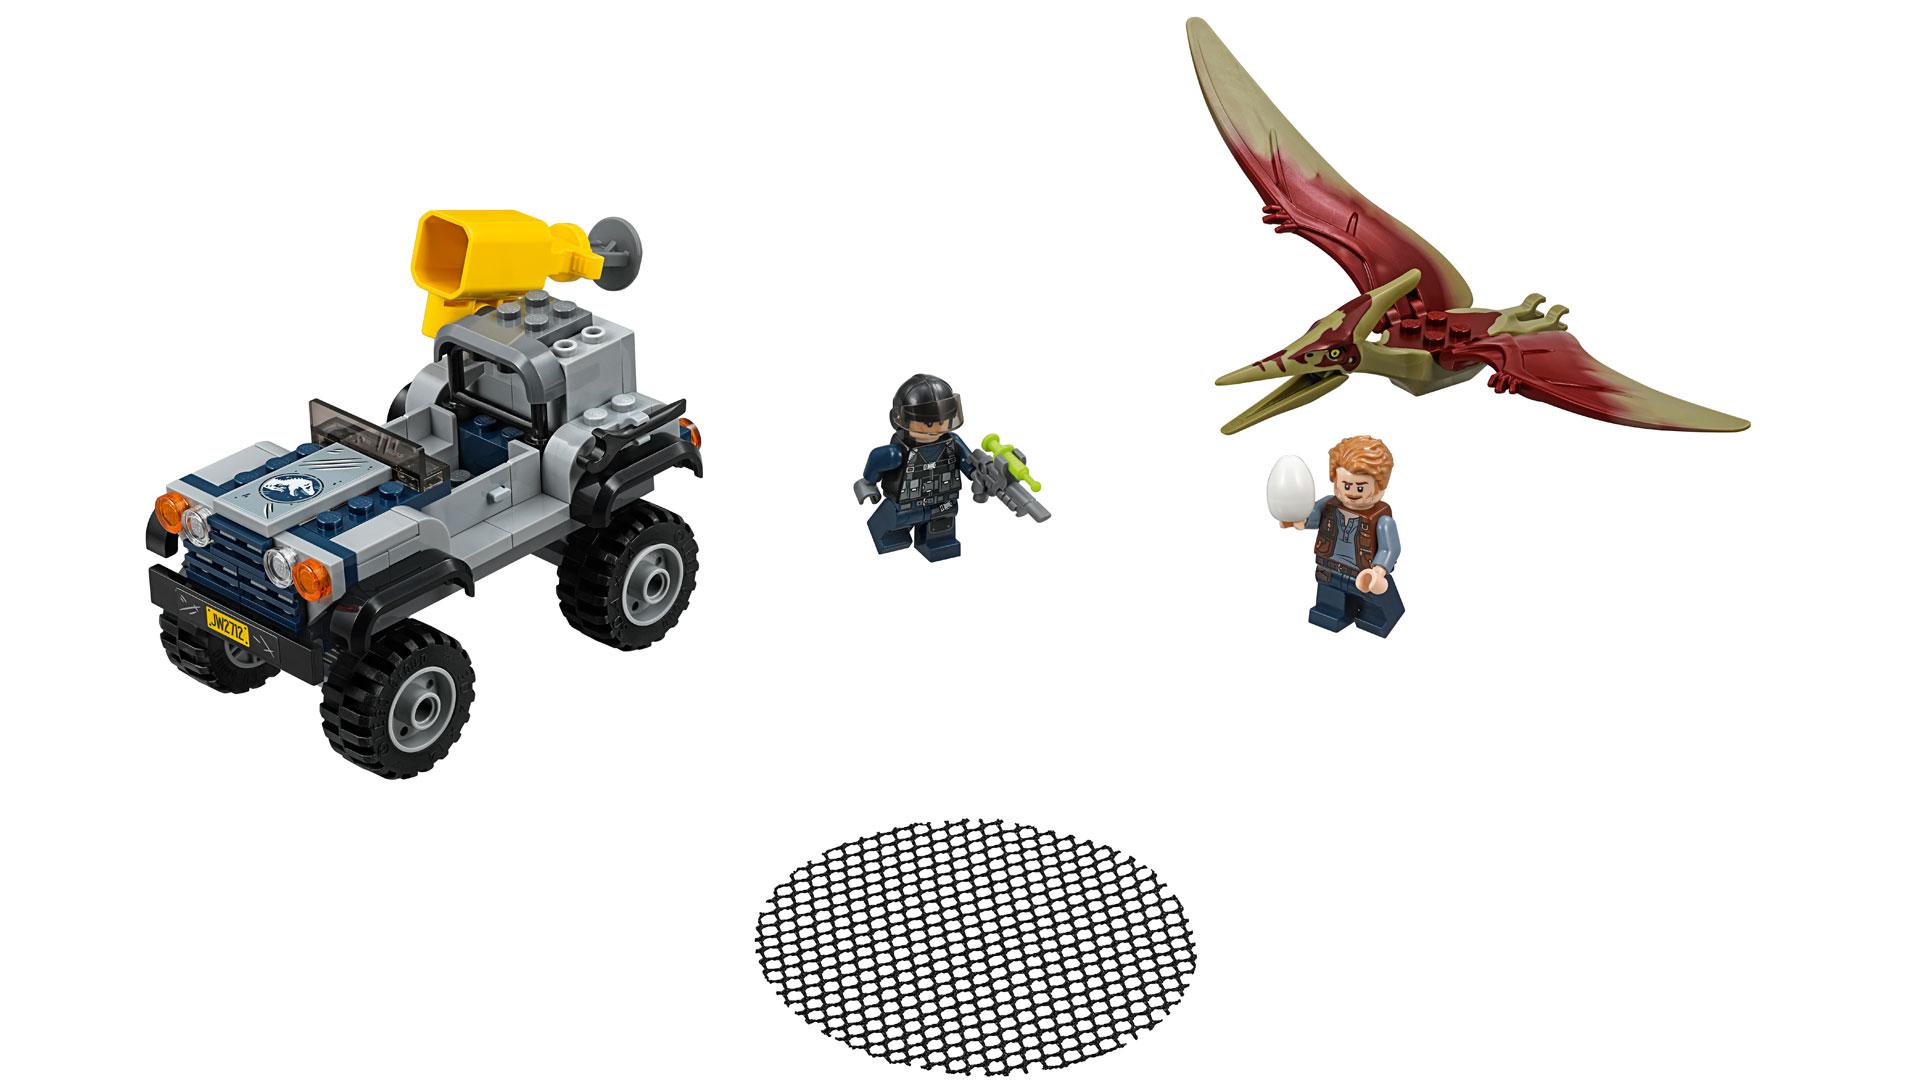 LEGO Jurassic World Set 75926 Pteranodon Chase at Toy Fair 2018